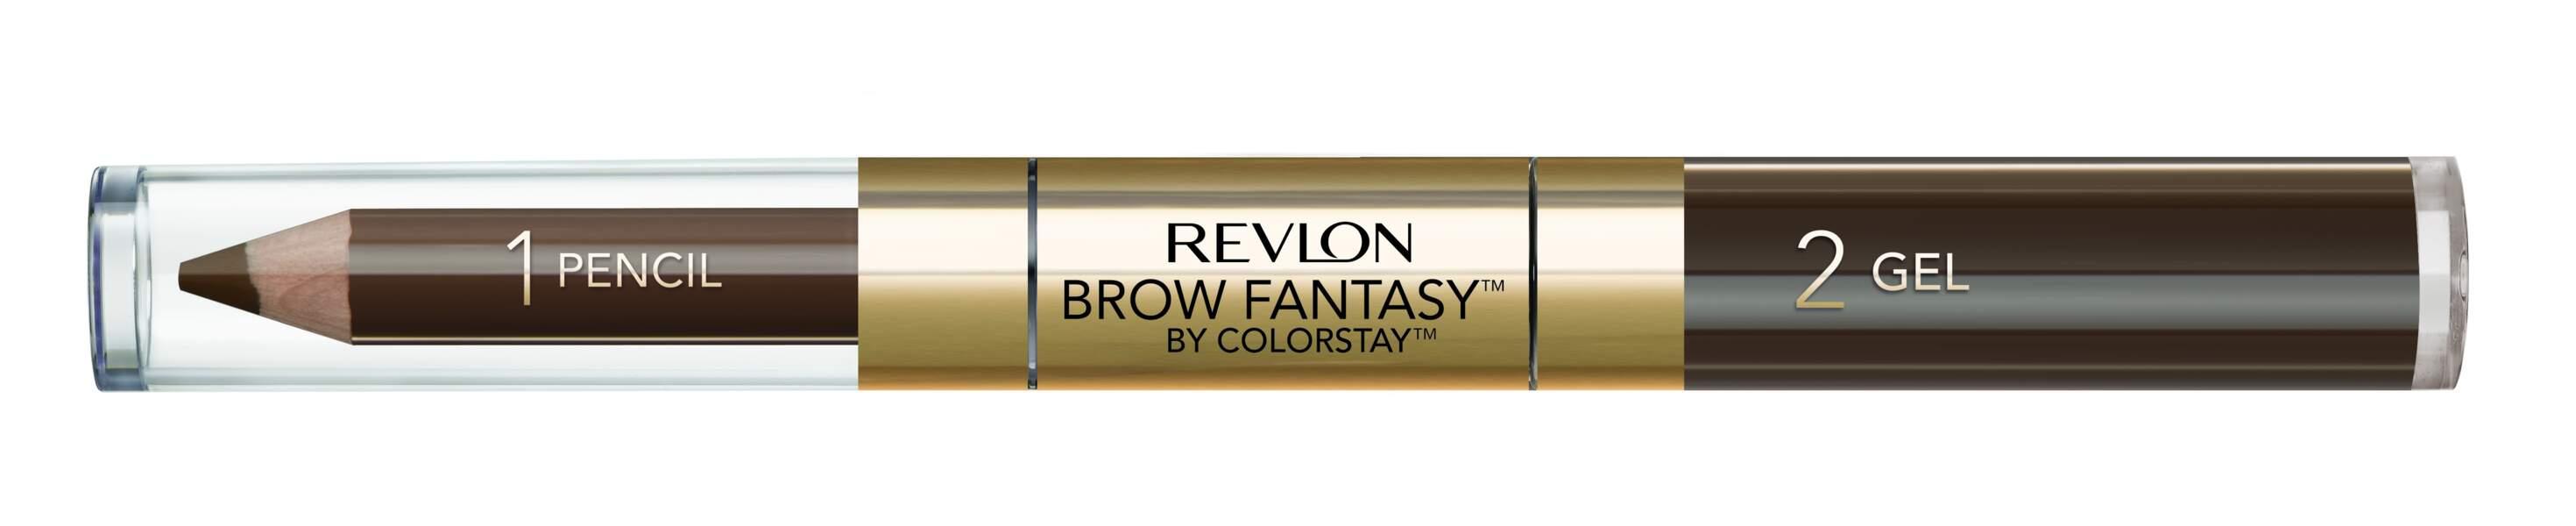 Brow Fantasy, Revlon, 10,90 €